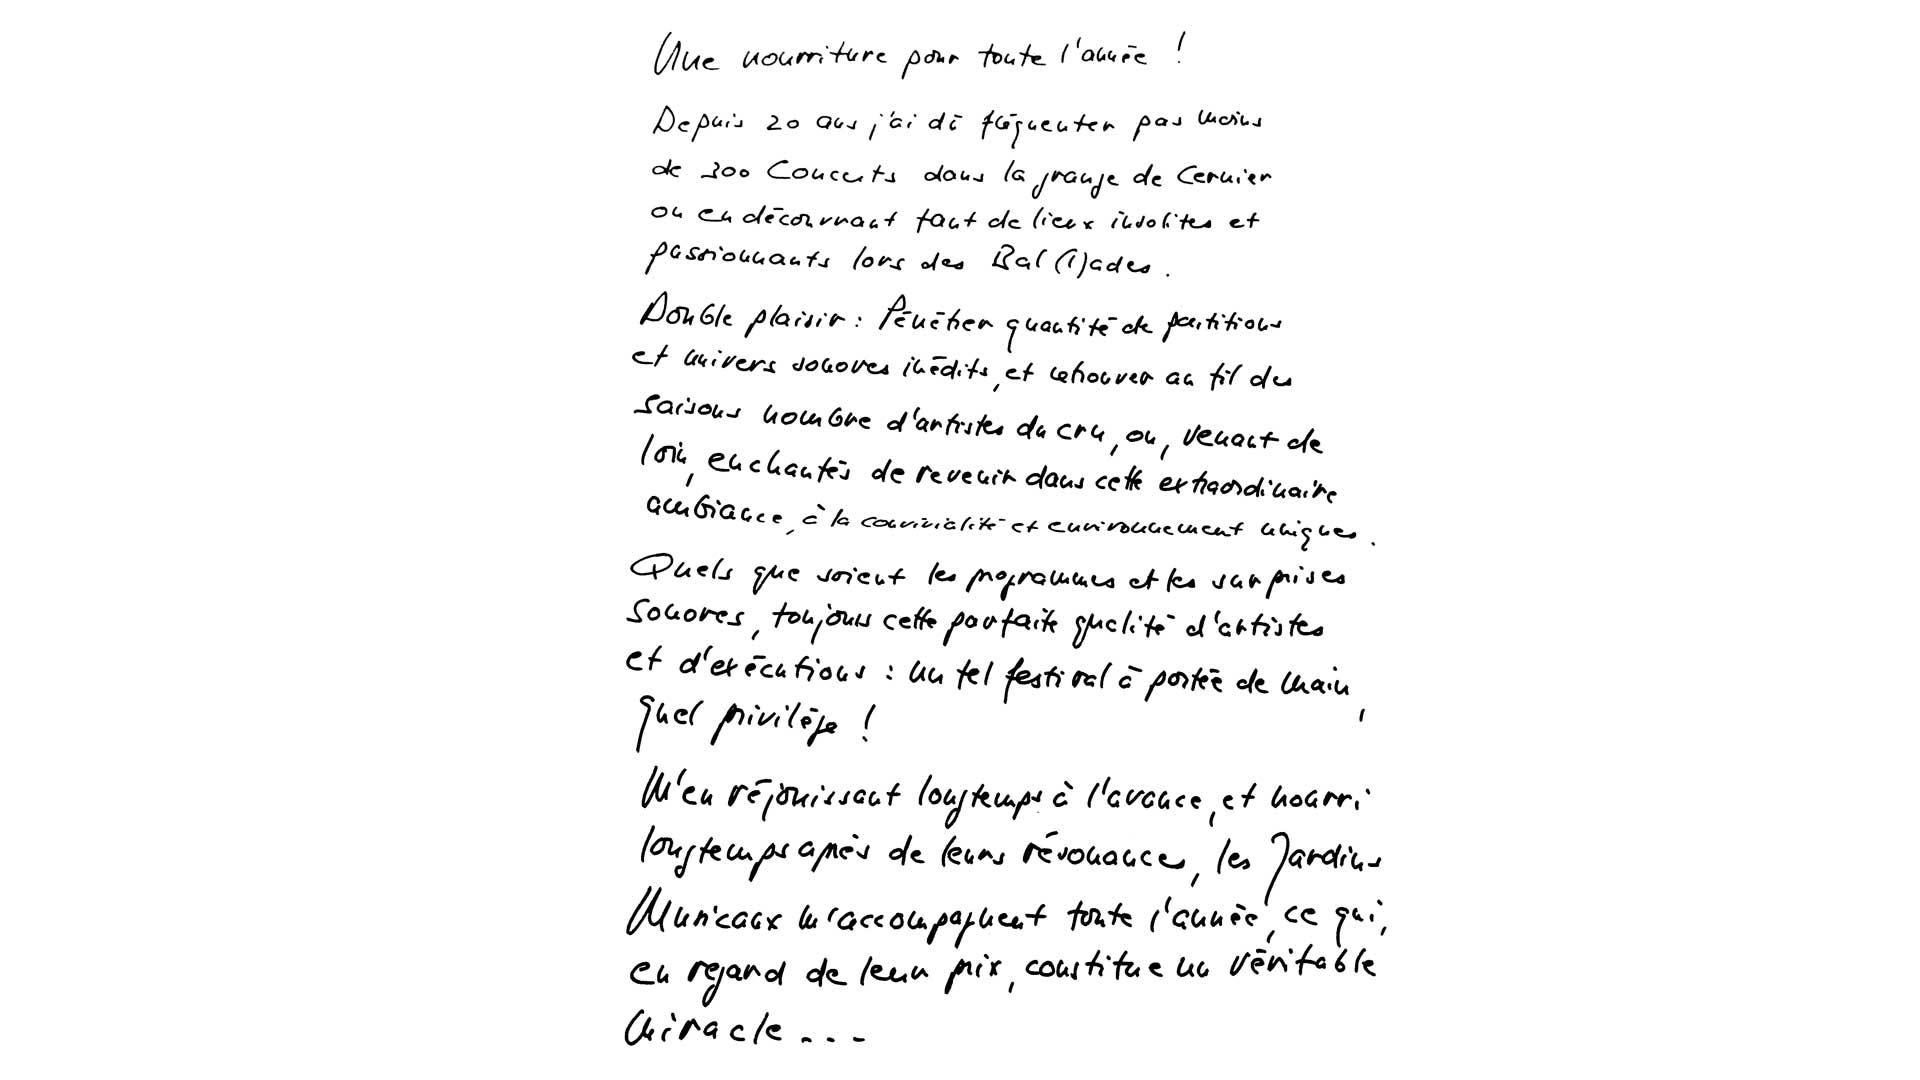 Texte de Pierre Macchi